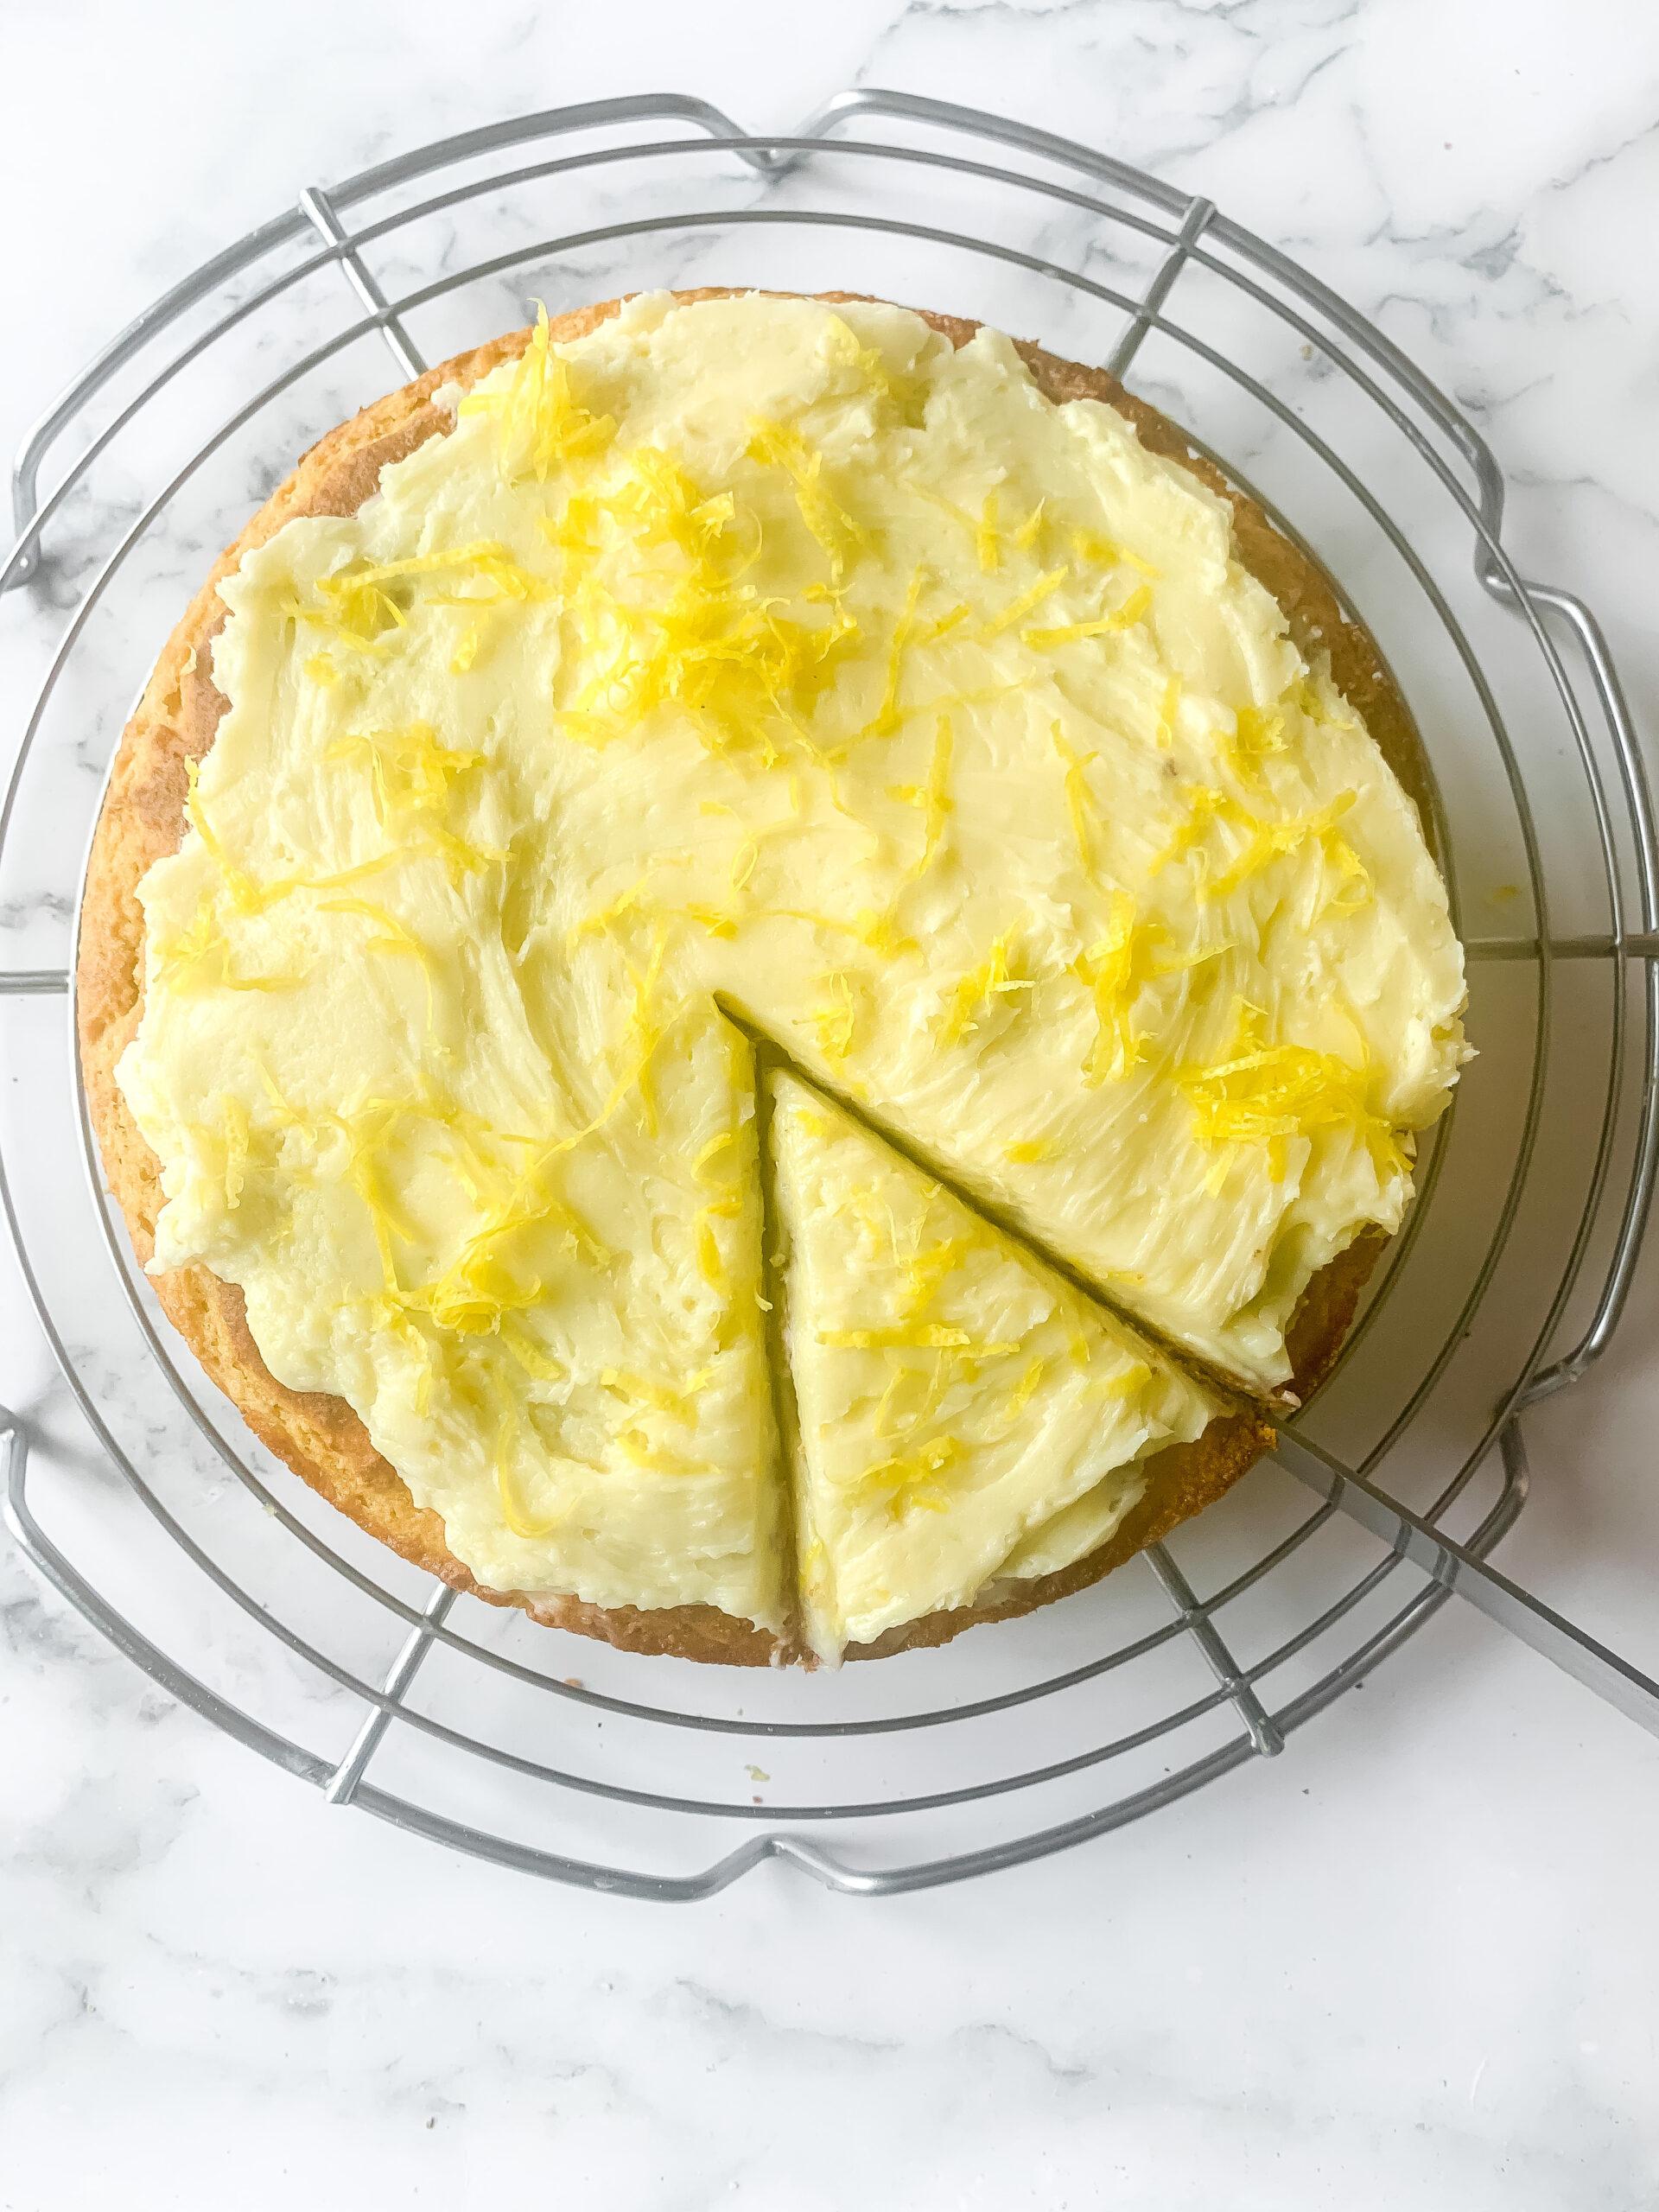 Lemon Yogurt Cake (Gluten free, Oil Free + Butter Free Option)